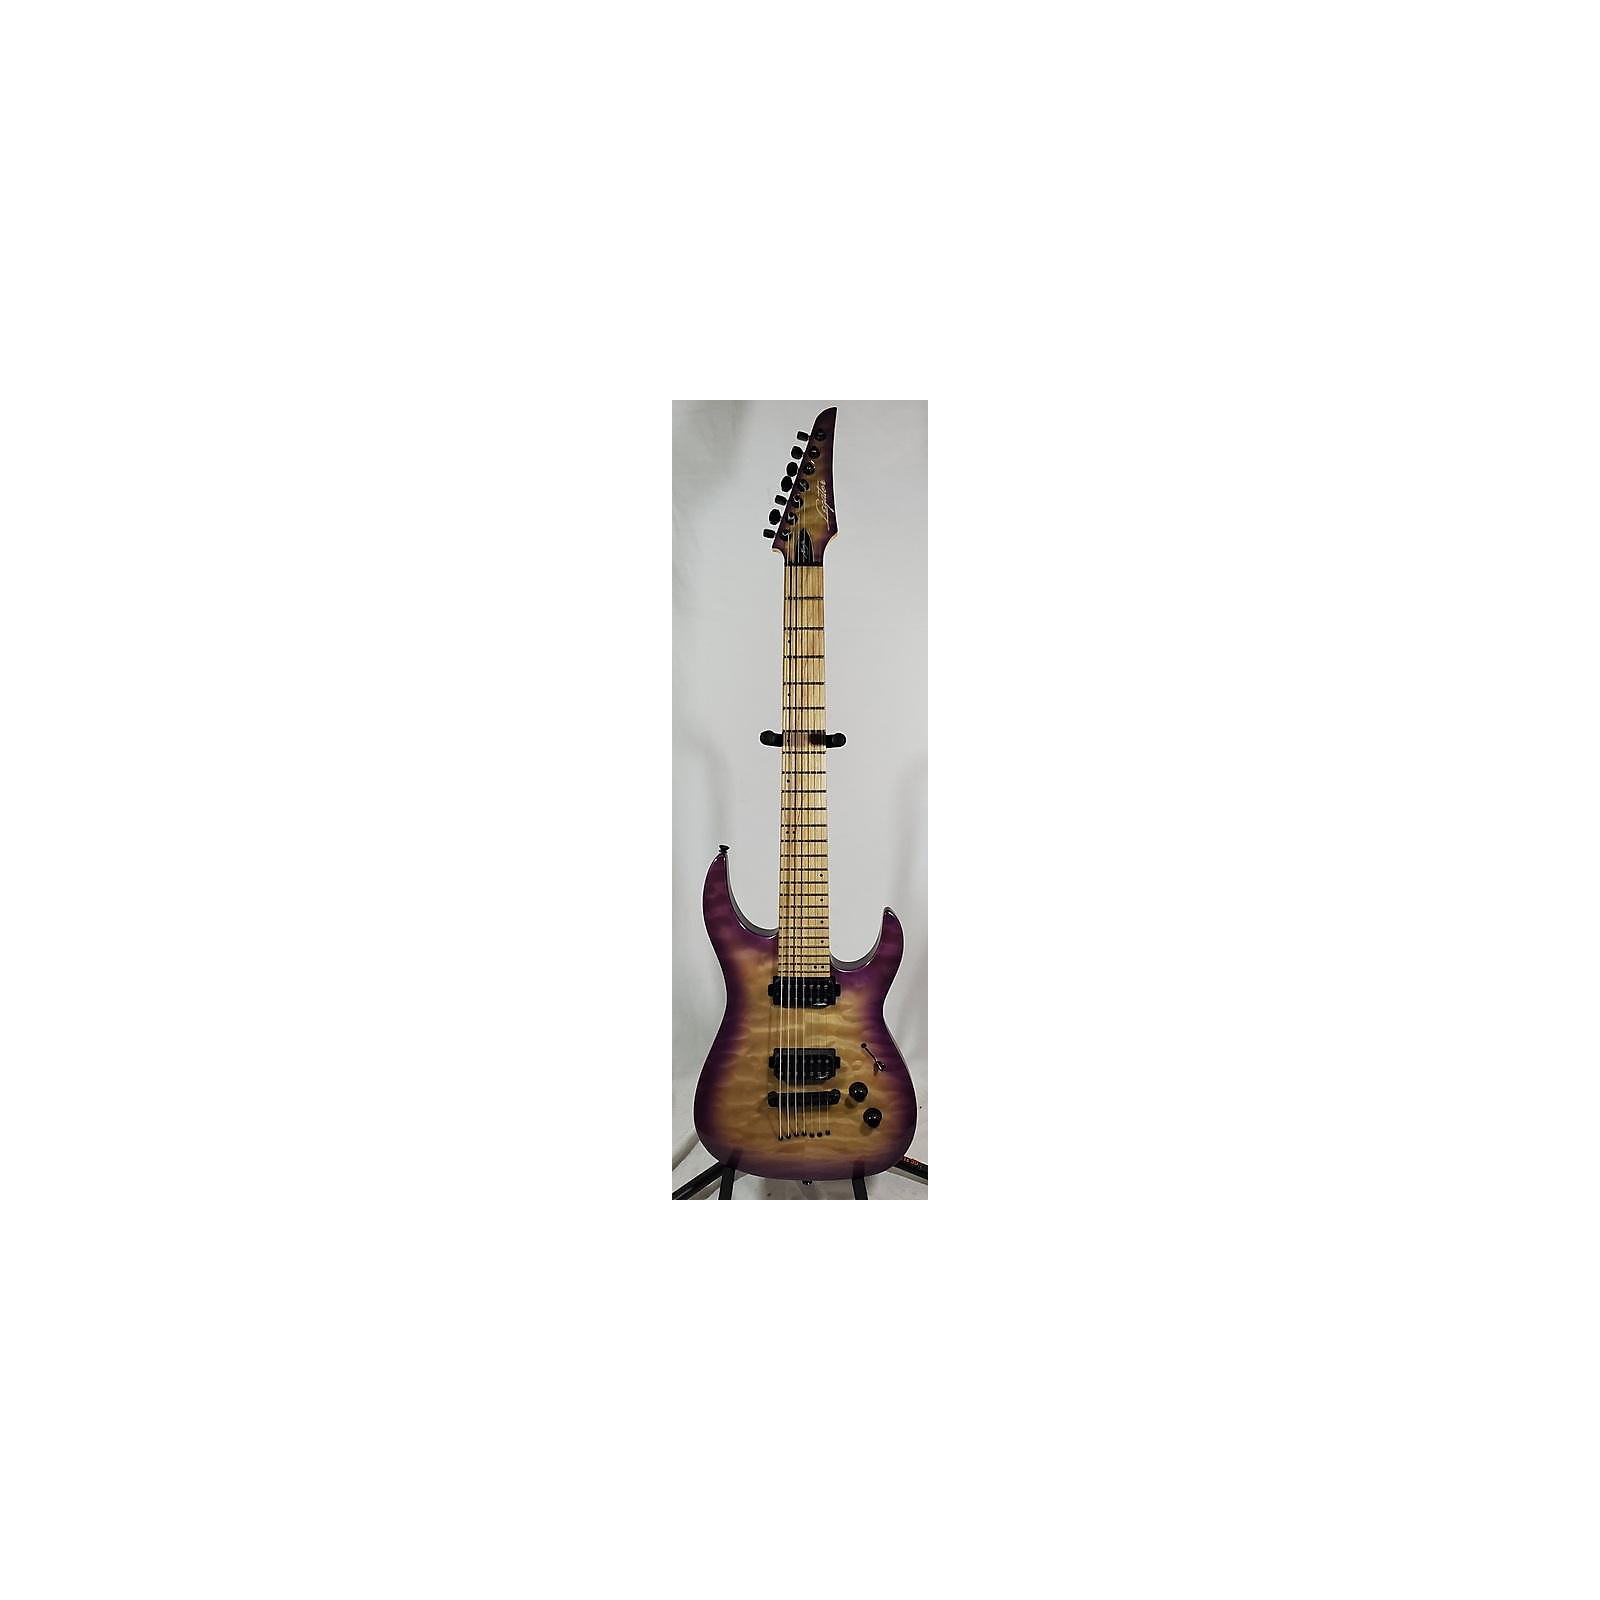 Legator Ninja 300 Pro 7 Solid Body Electric Guitar